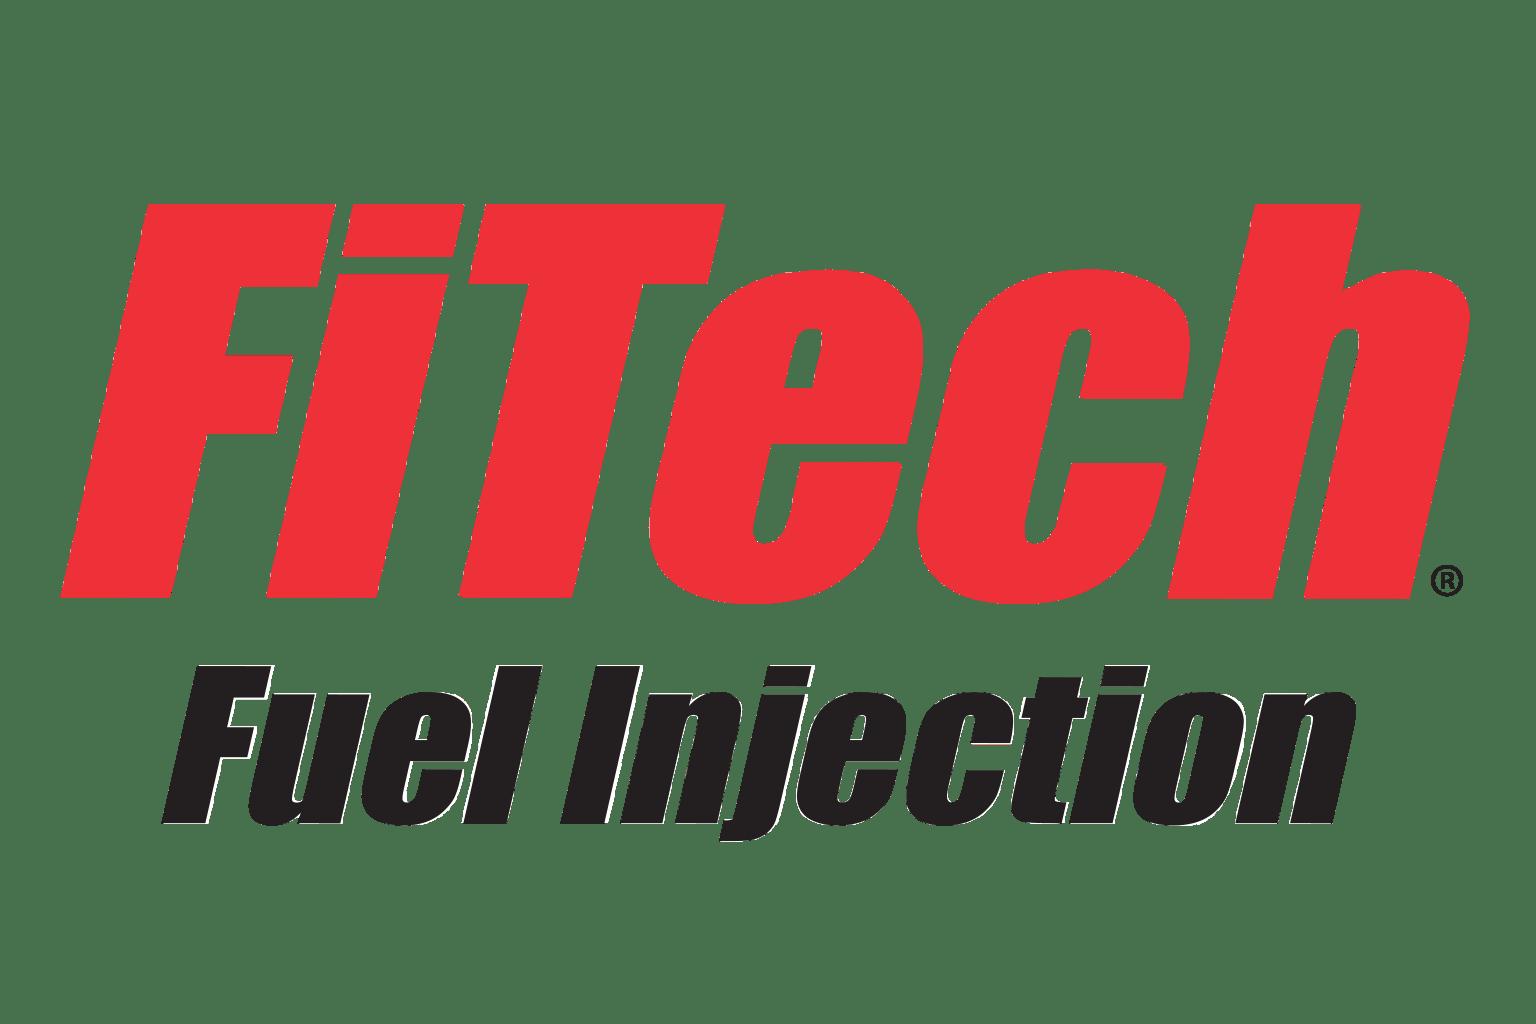 FiTech